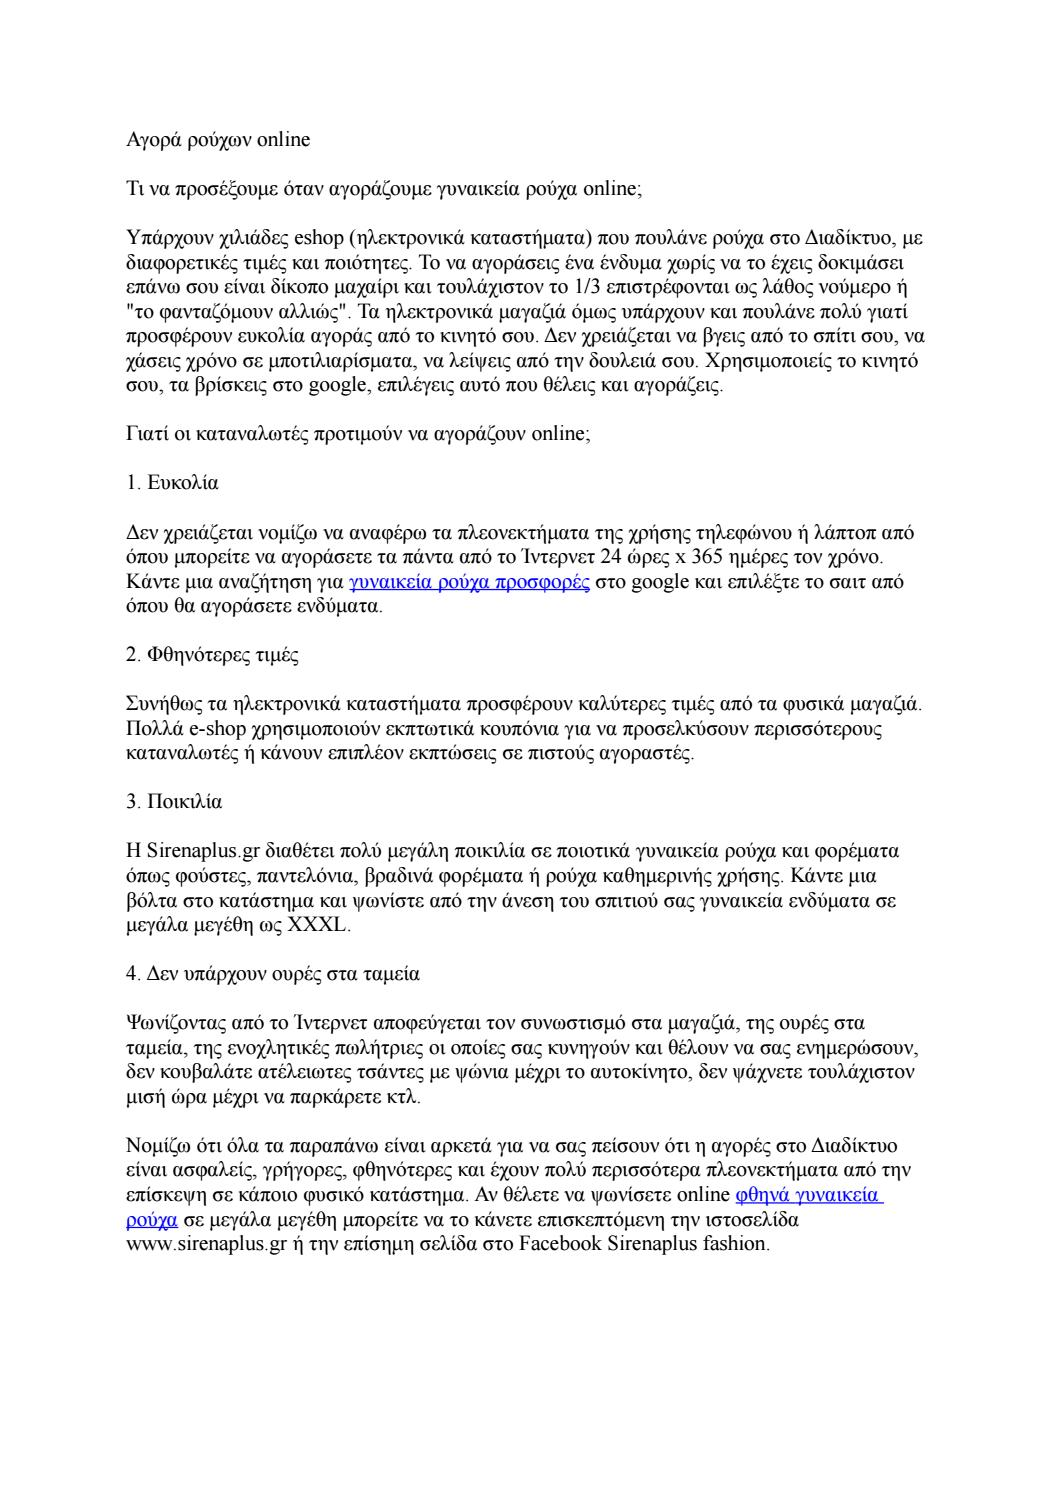 b0dc30a909b Agora rouxon online by Pano Kontogiannis (Пано Кондоянис) - issuu